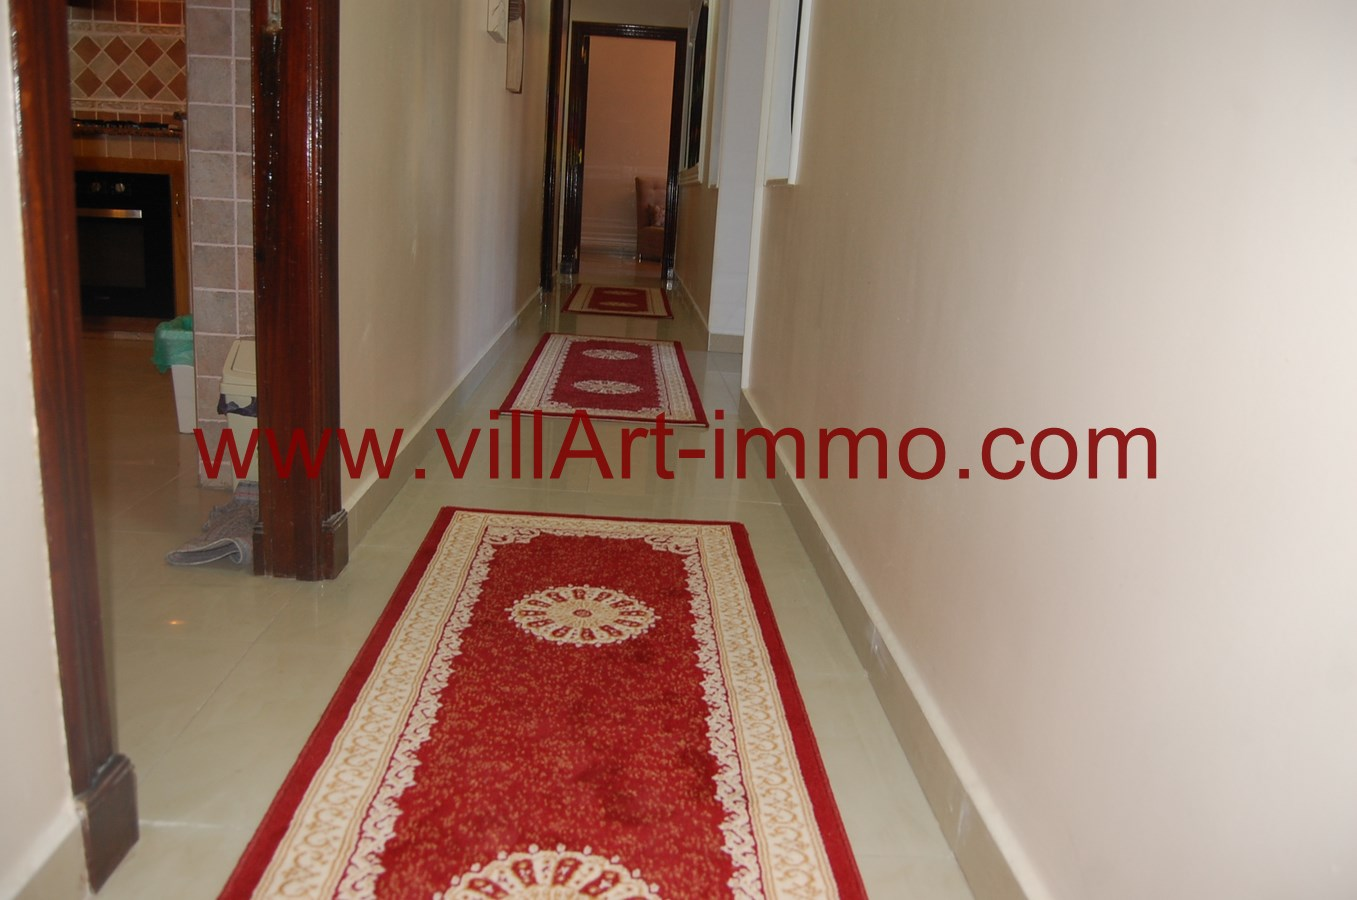 10-vente-appartement-tanger-iberia-couloir-va435-villart-immo